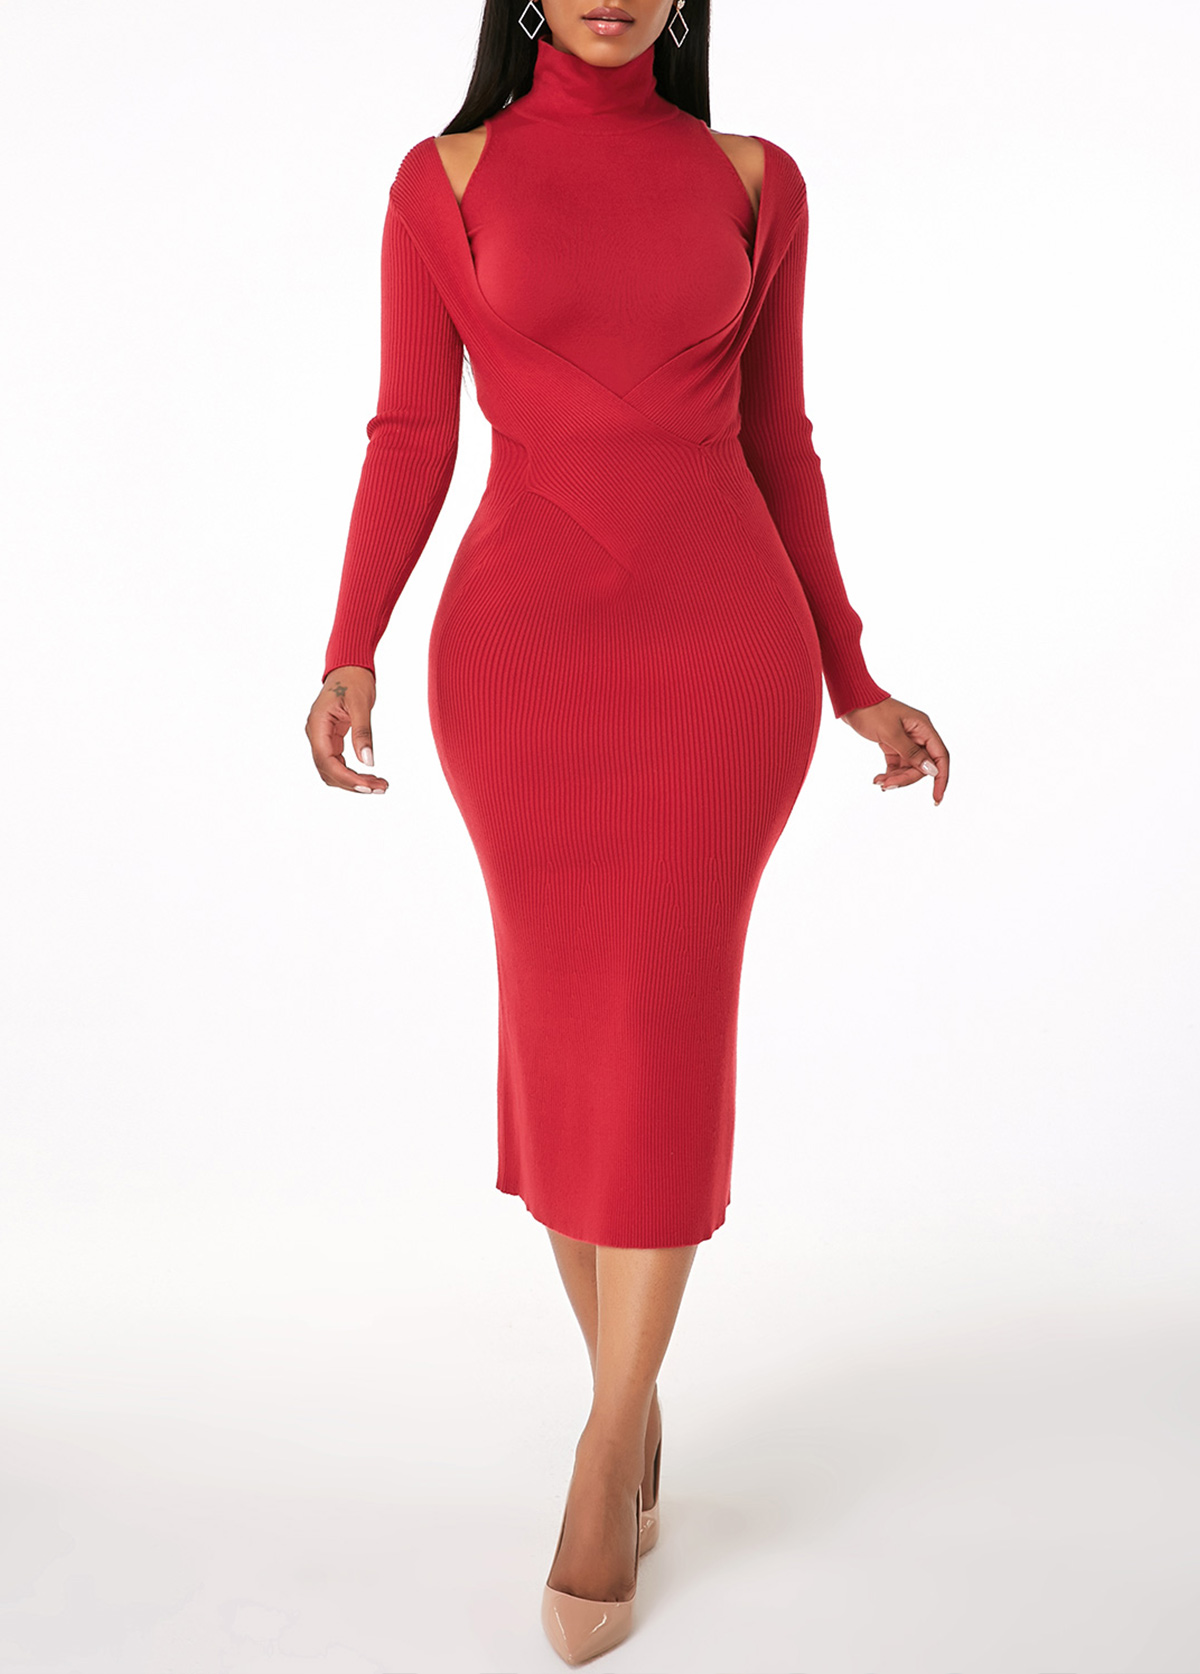 ROTITA Red Turtleneck Tank Top and Sweater Dress